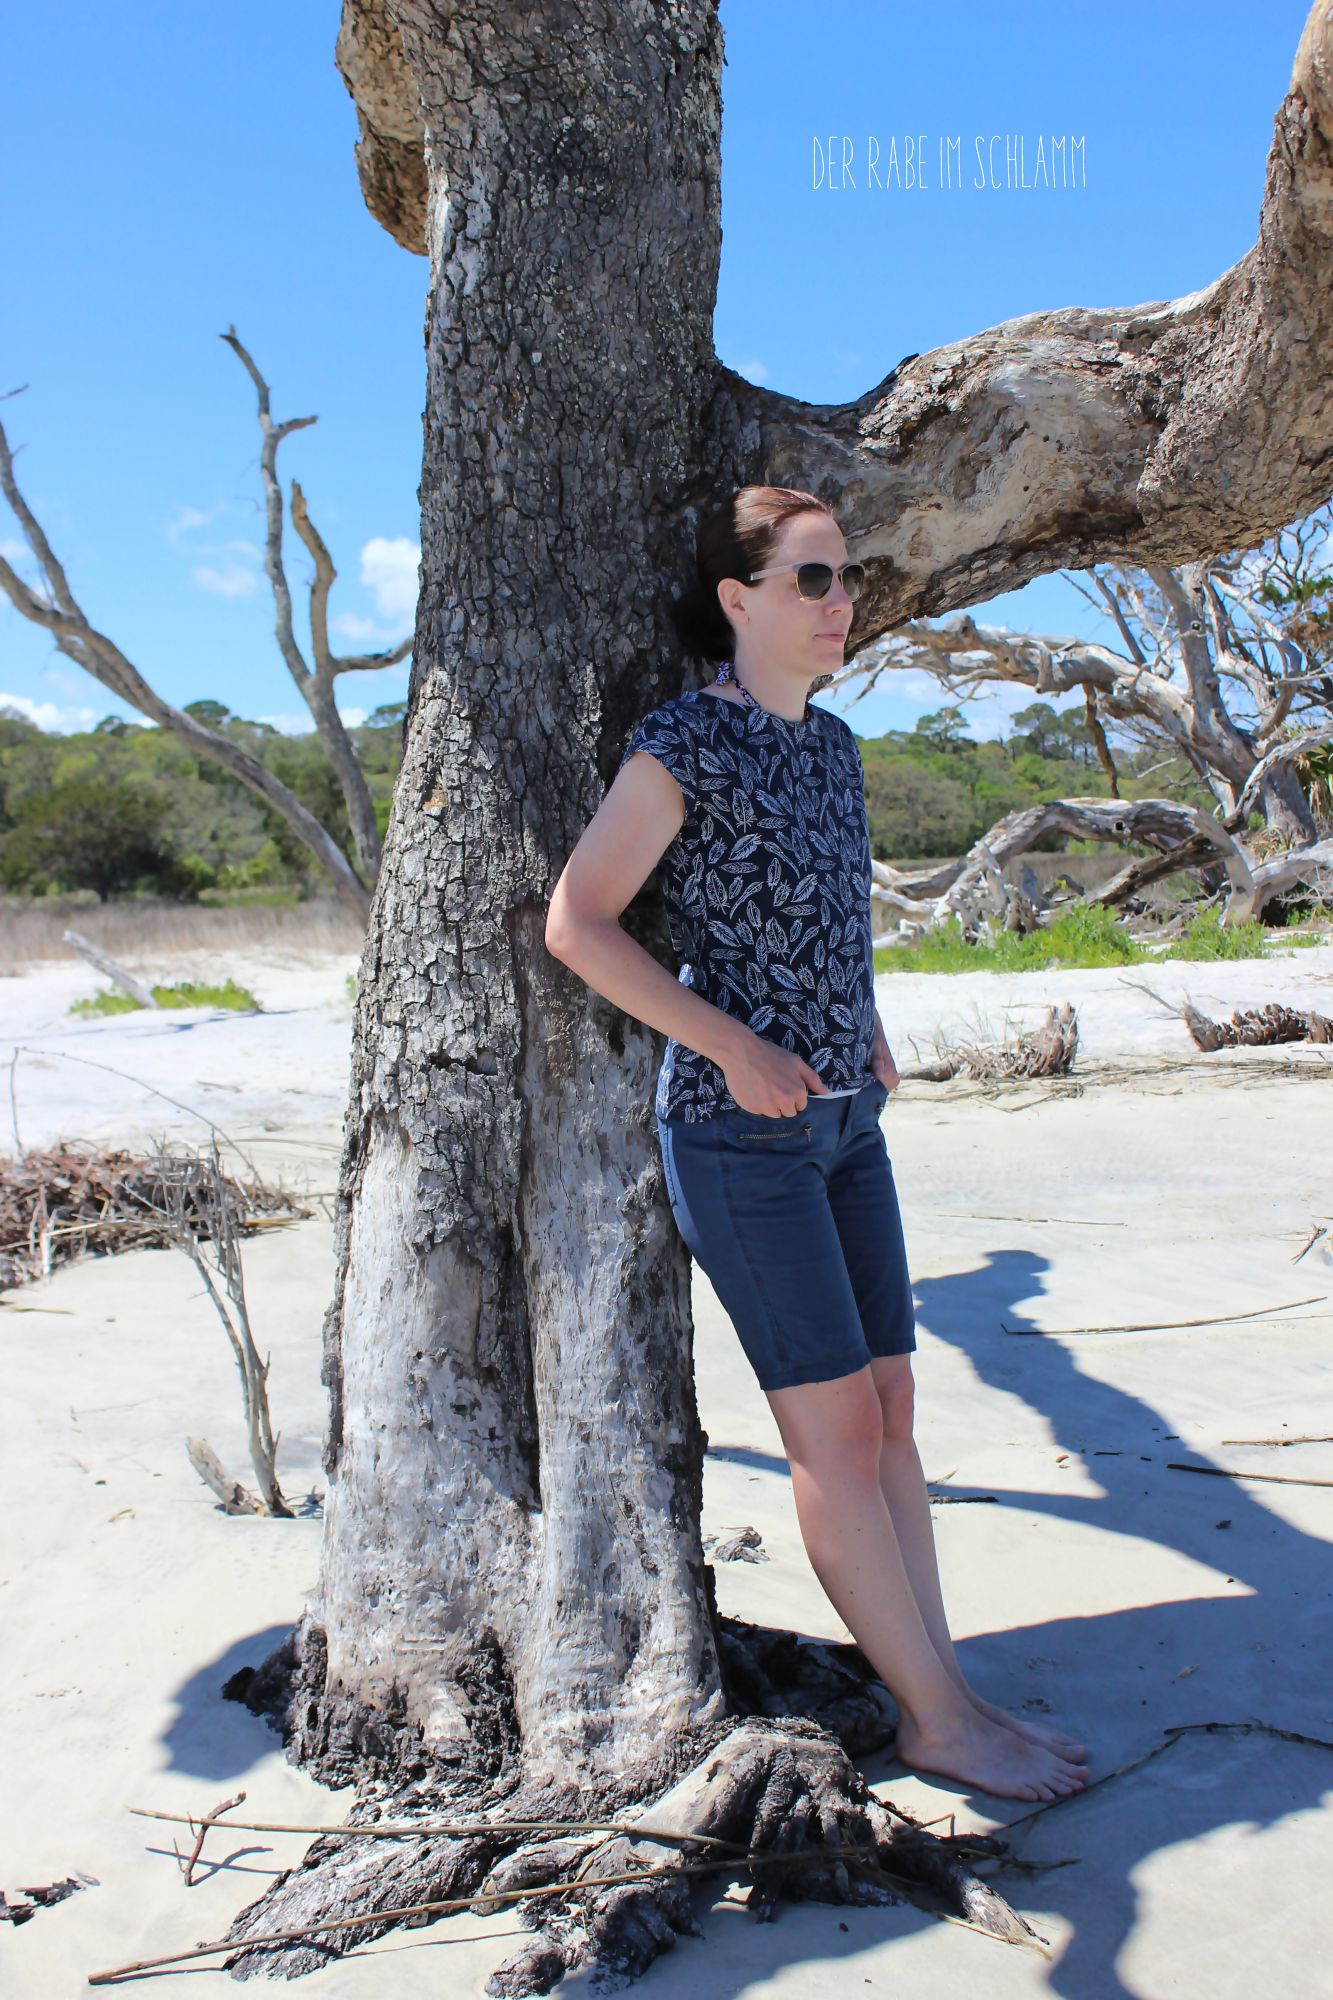 Der Rabe im Schlamm, Kimono Tee, Nähen, Schnittmuster, Damen, Art Gallery Fabrics, Petal and Plume, Driftwood Beach